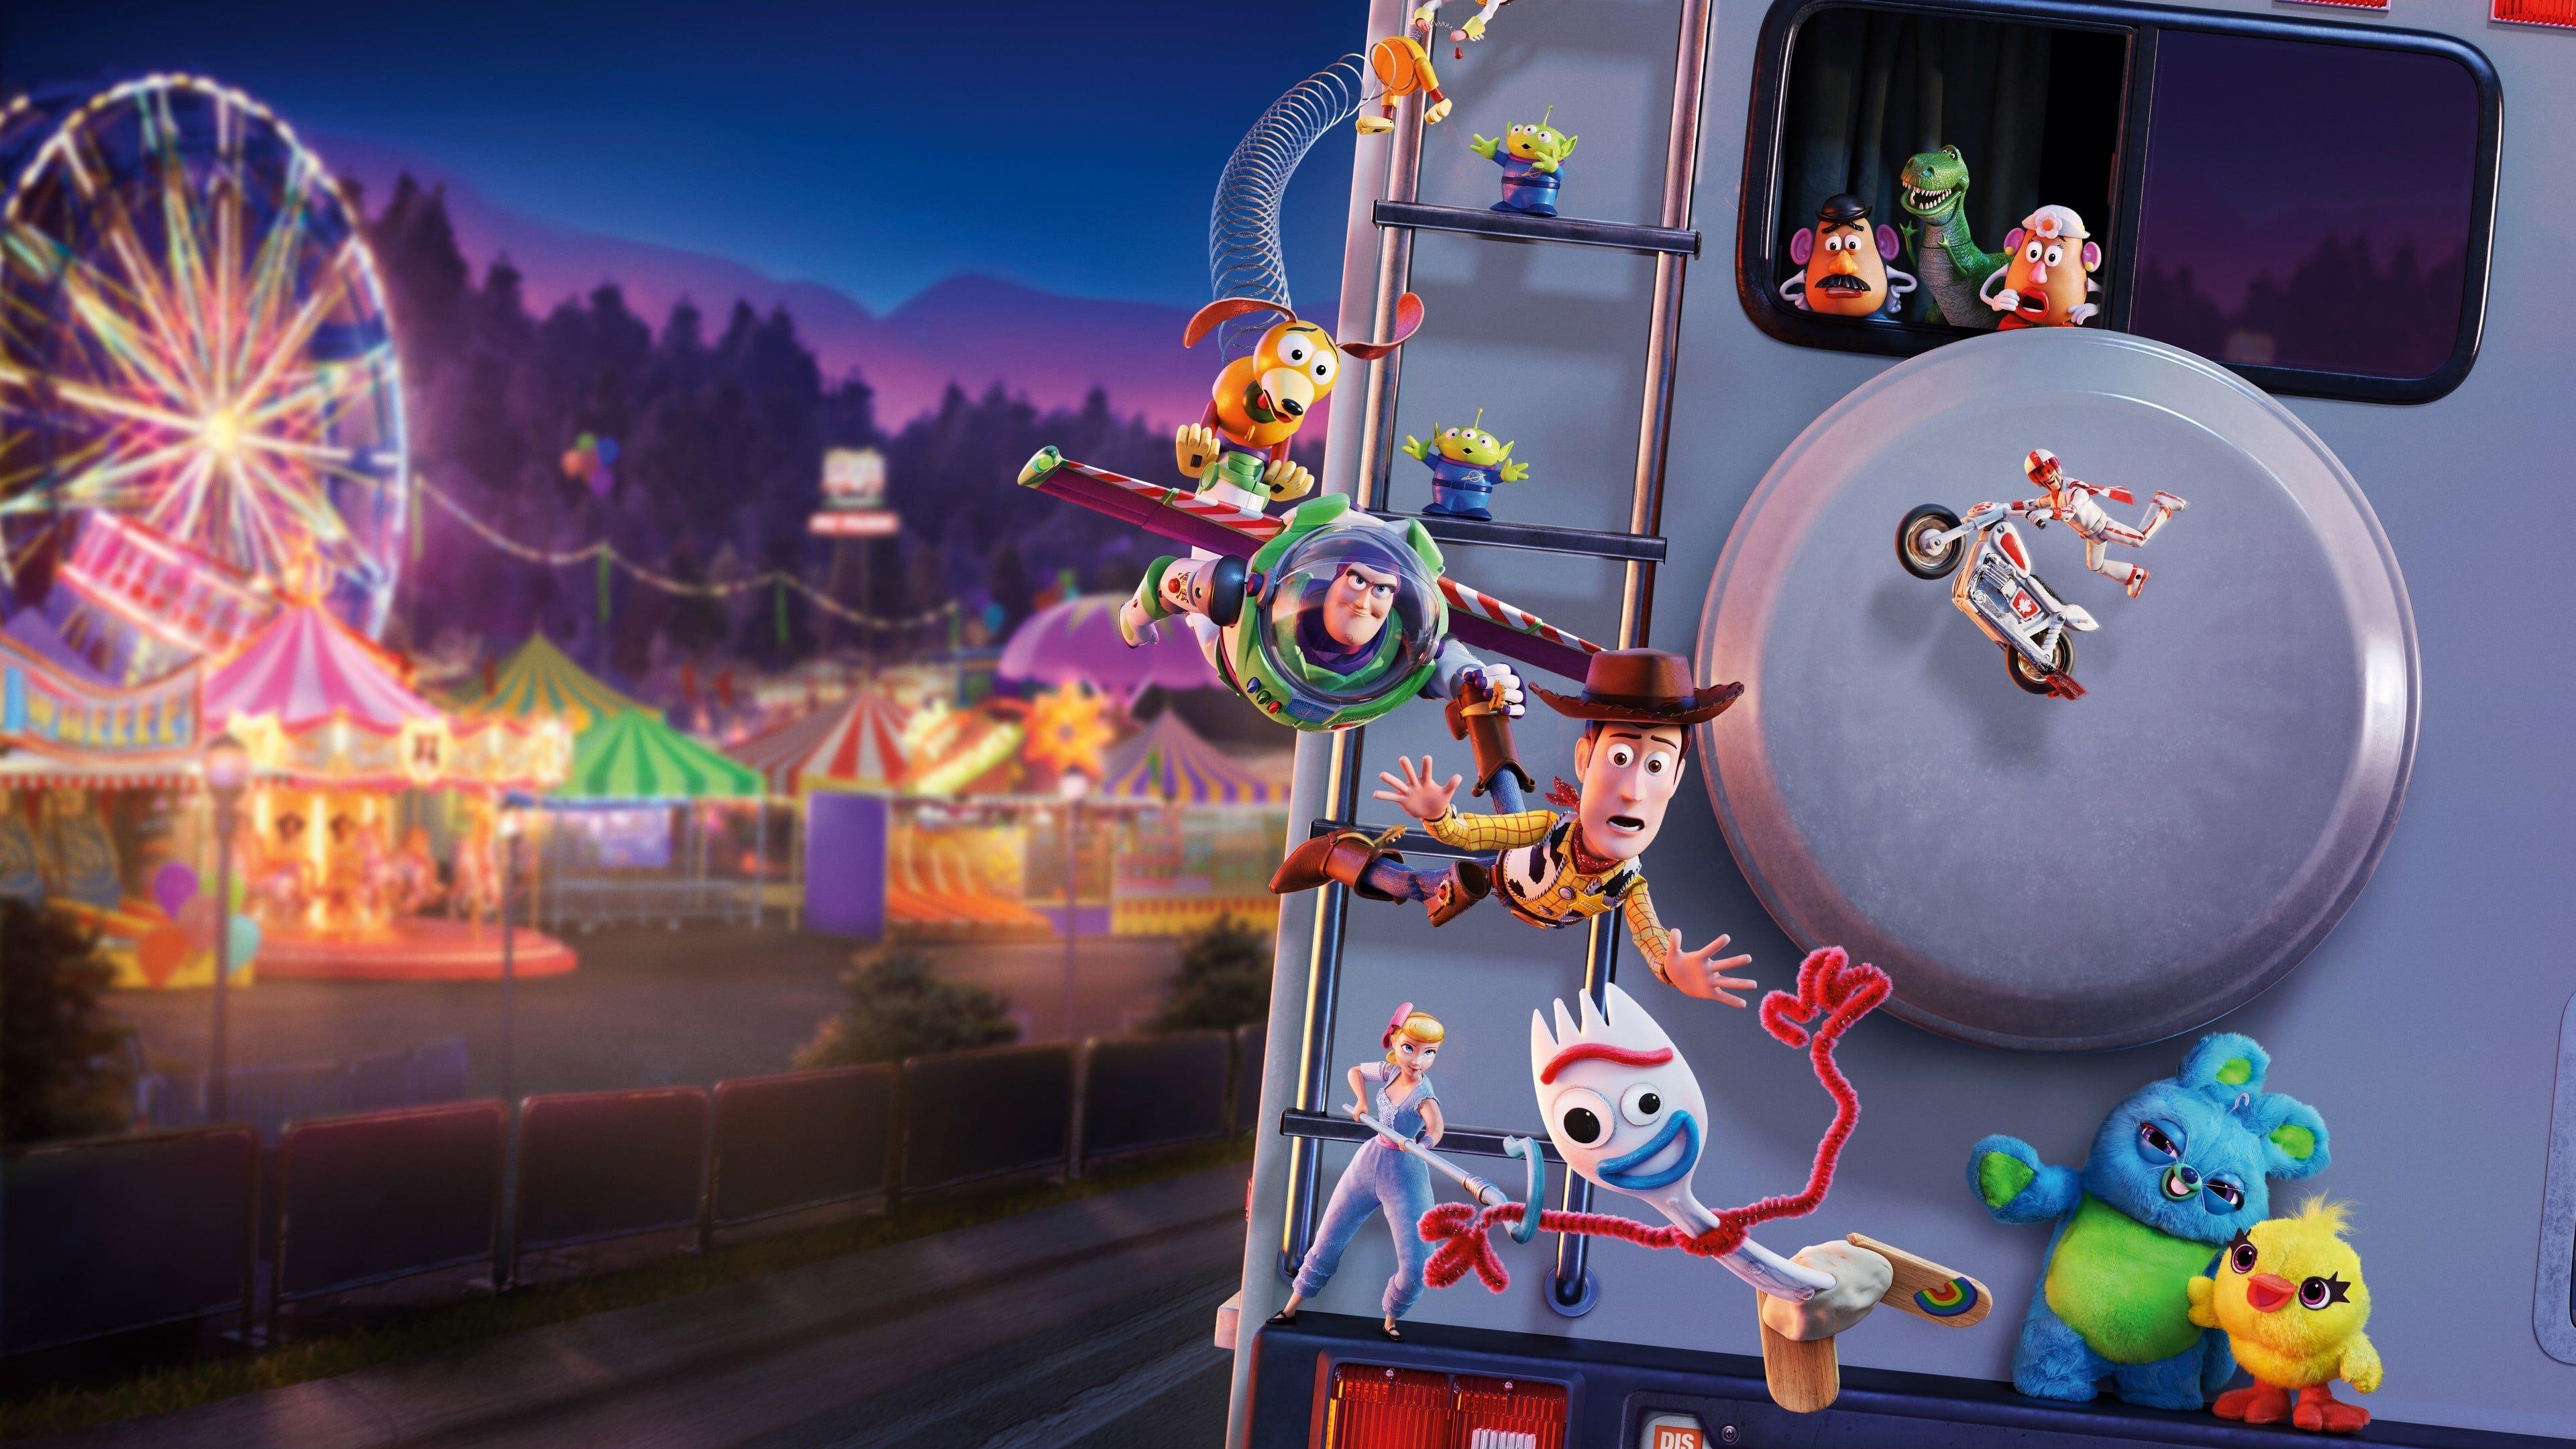 Ver Toy Story 4 Pelicula Completa Audio Latino Peliculas Completas Walt Disney Pictures Peliculas De Animacion